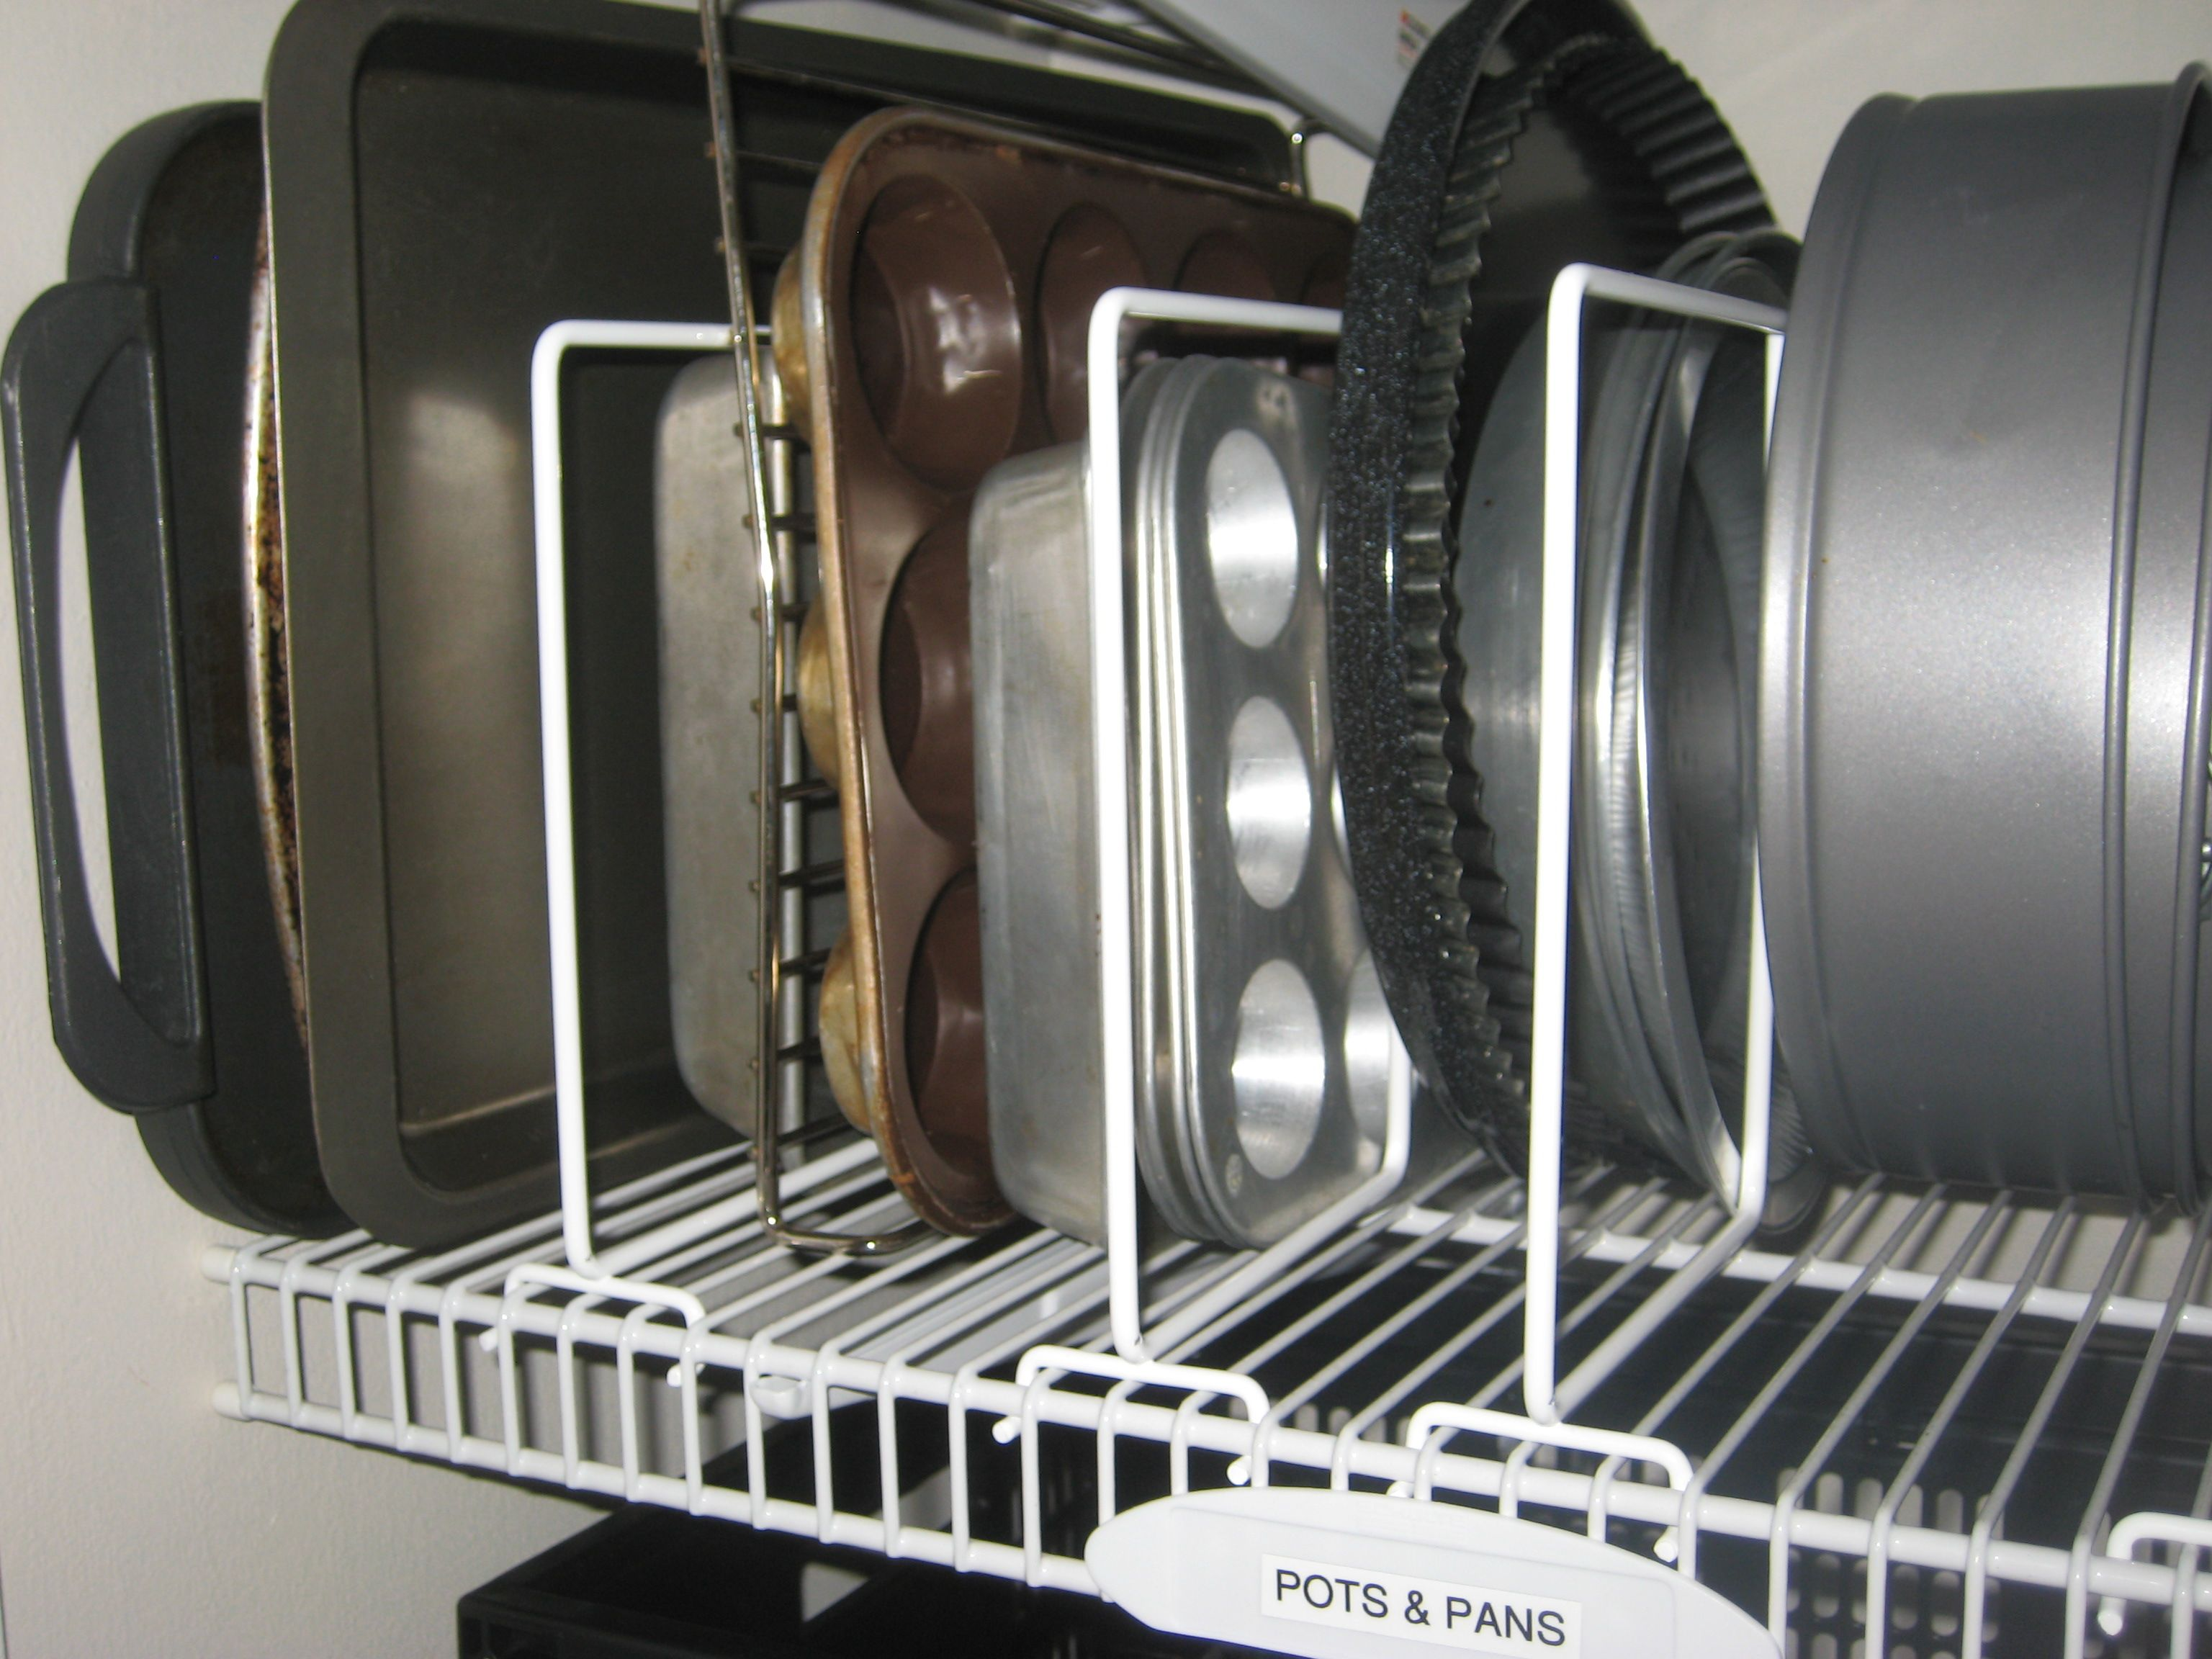 Kitchen Organization Pantry Organization Vertical Pan Divider